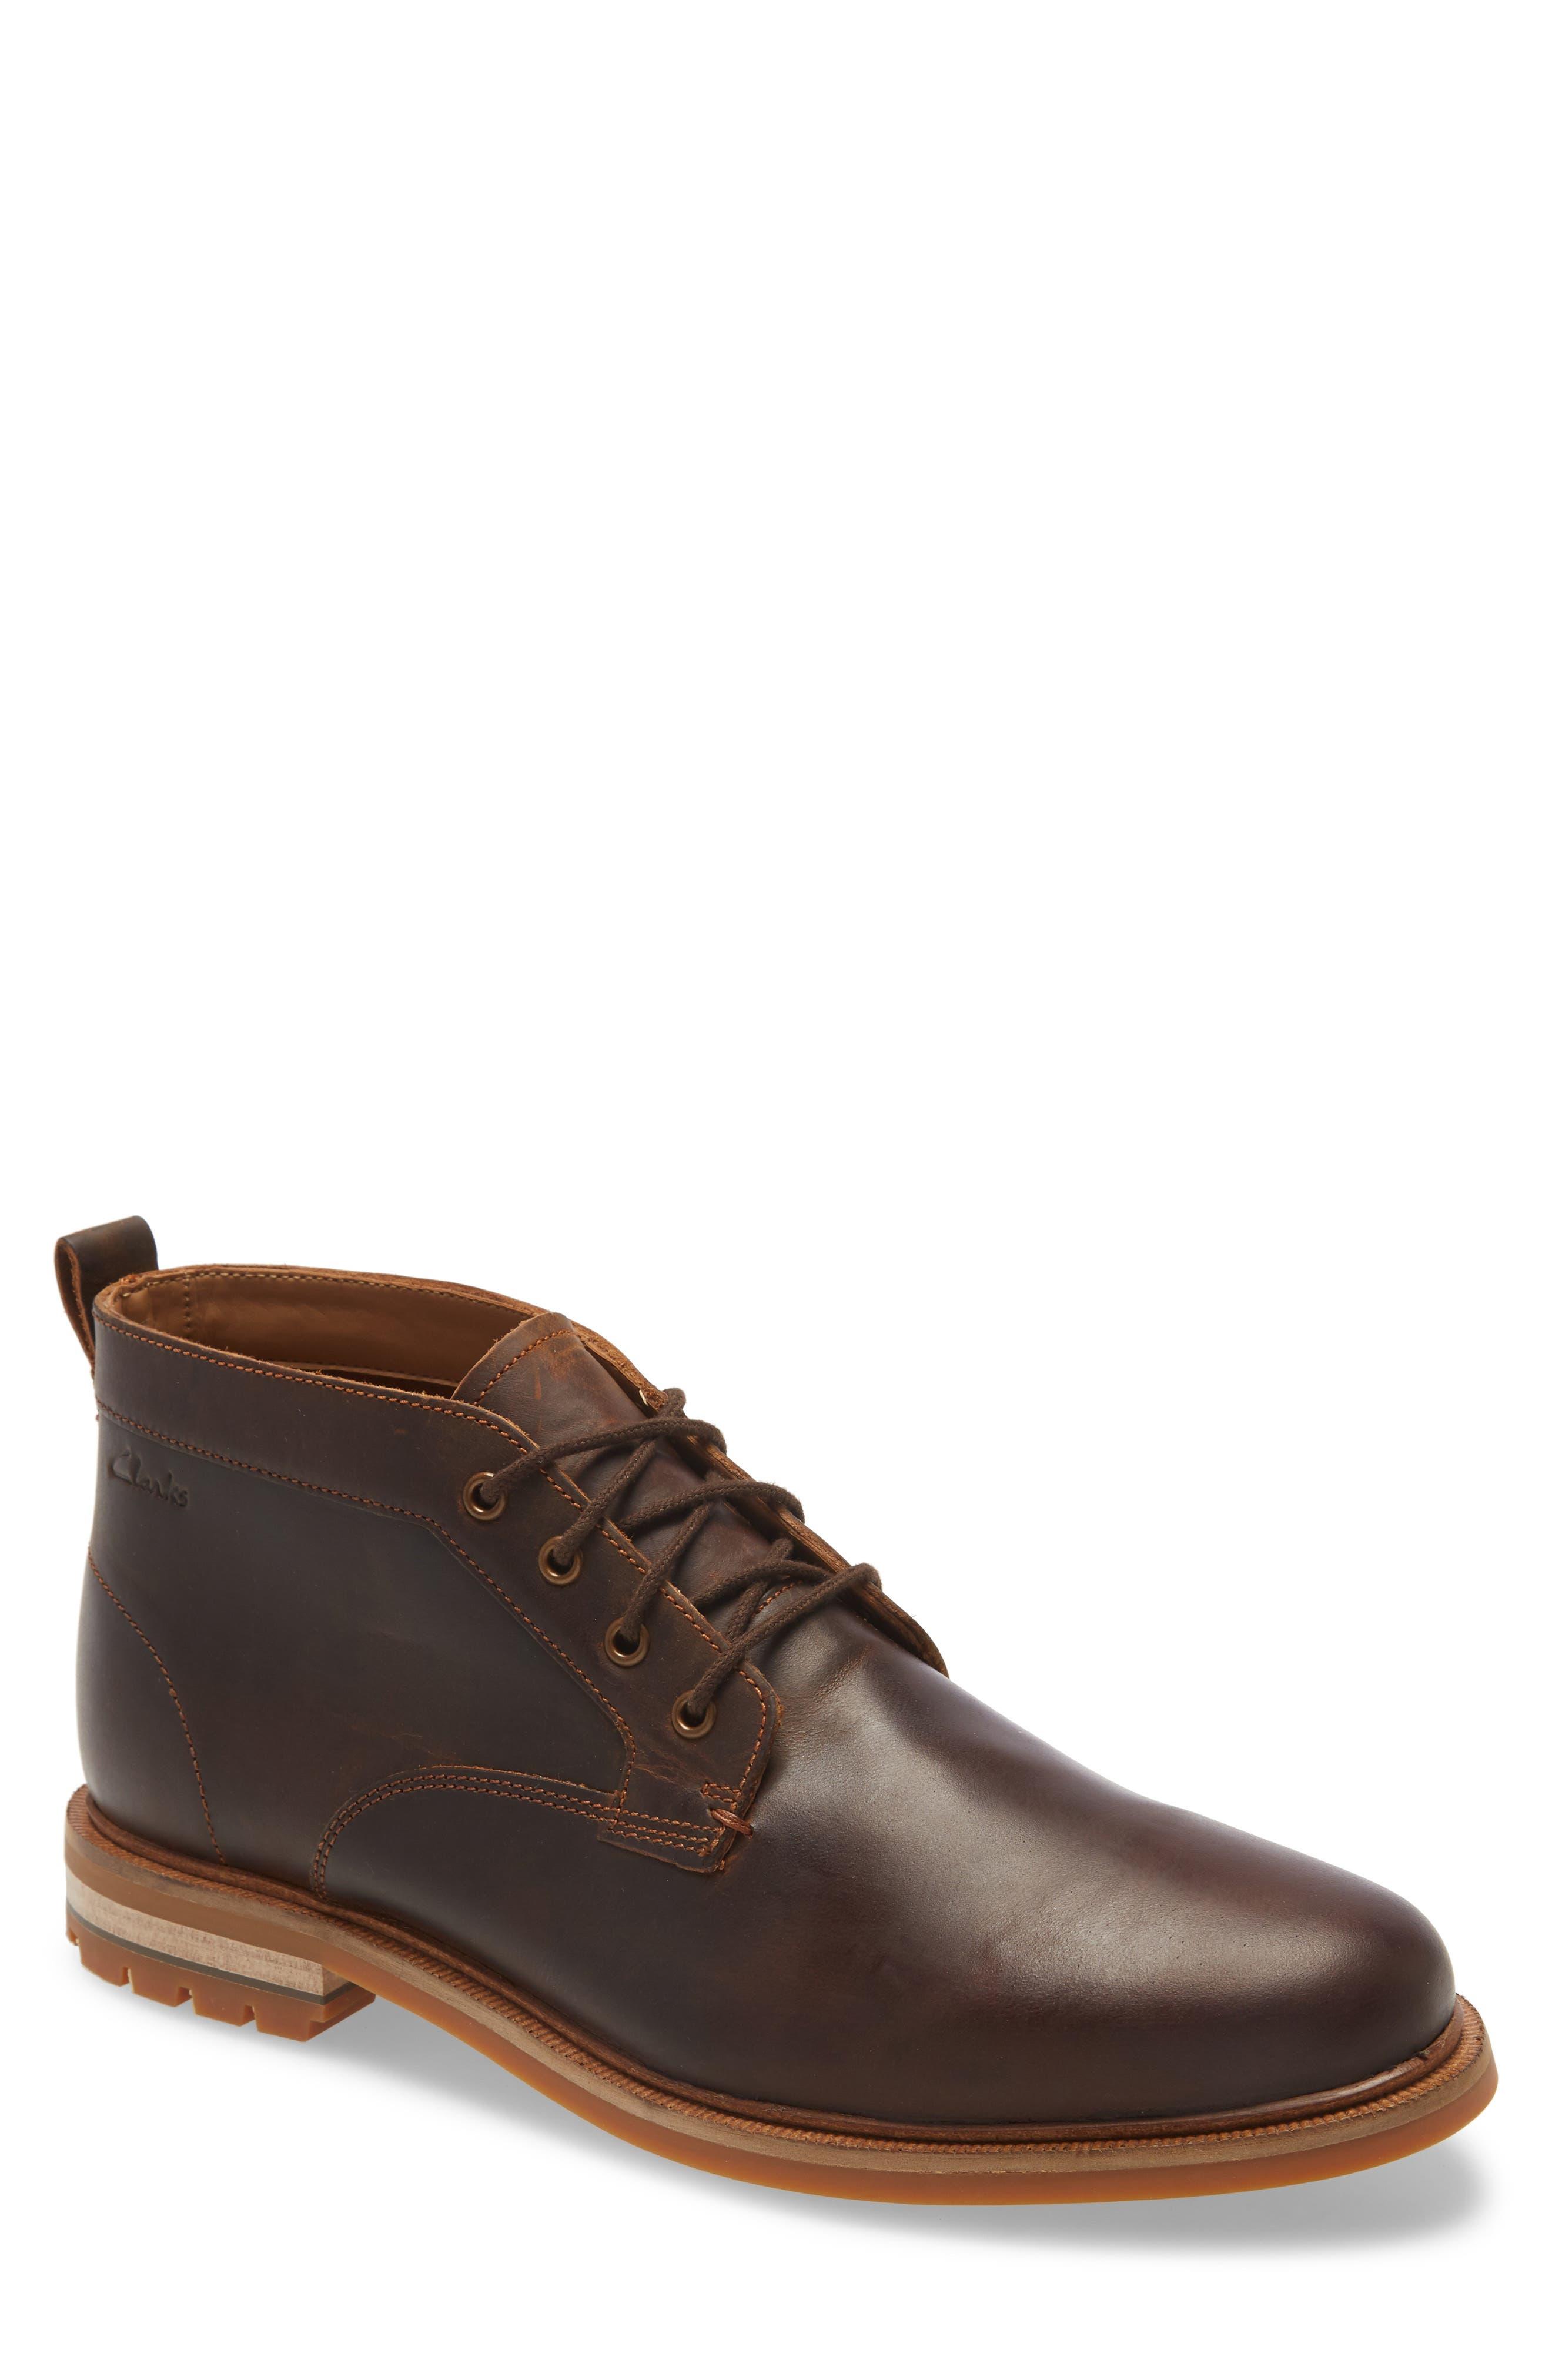 Men's Clarks Foxwell Chukka Boot